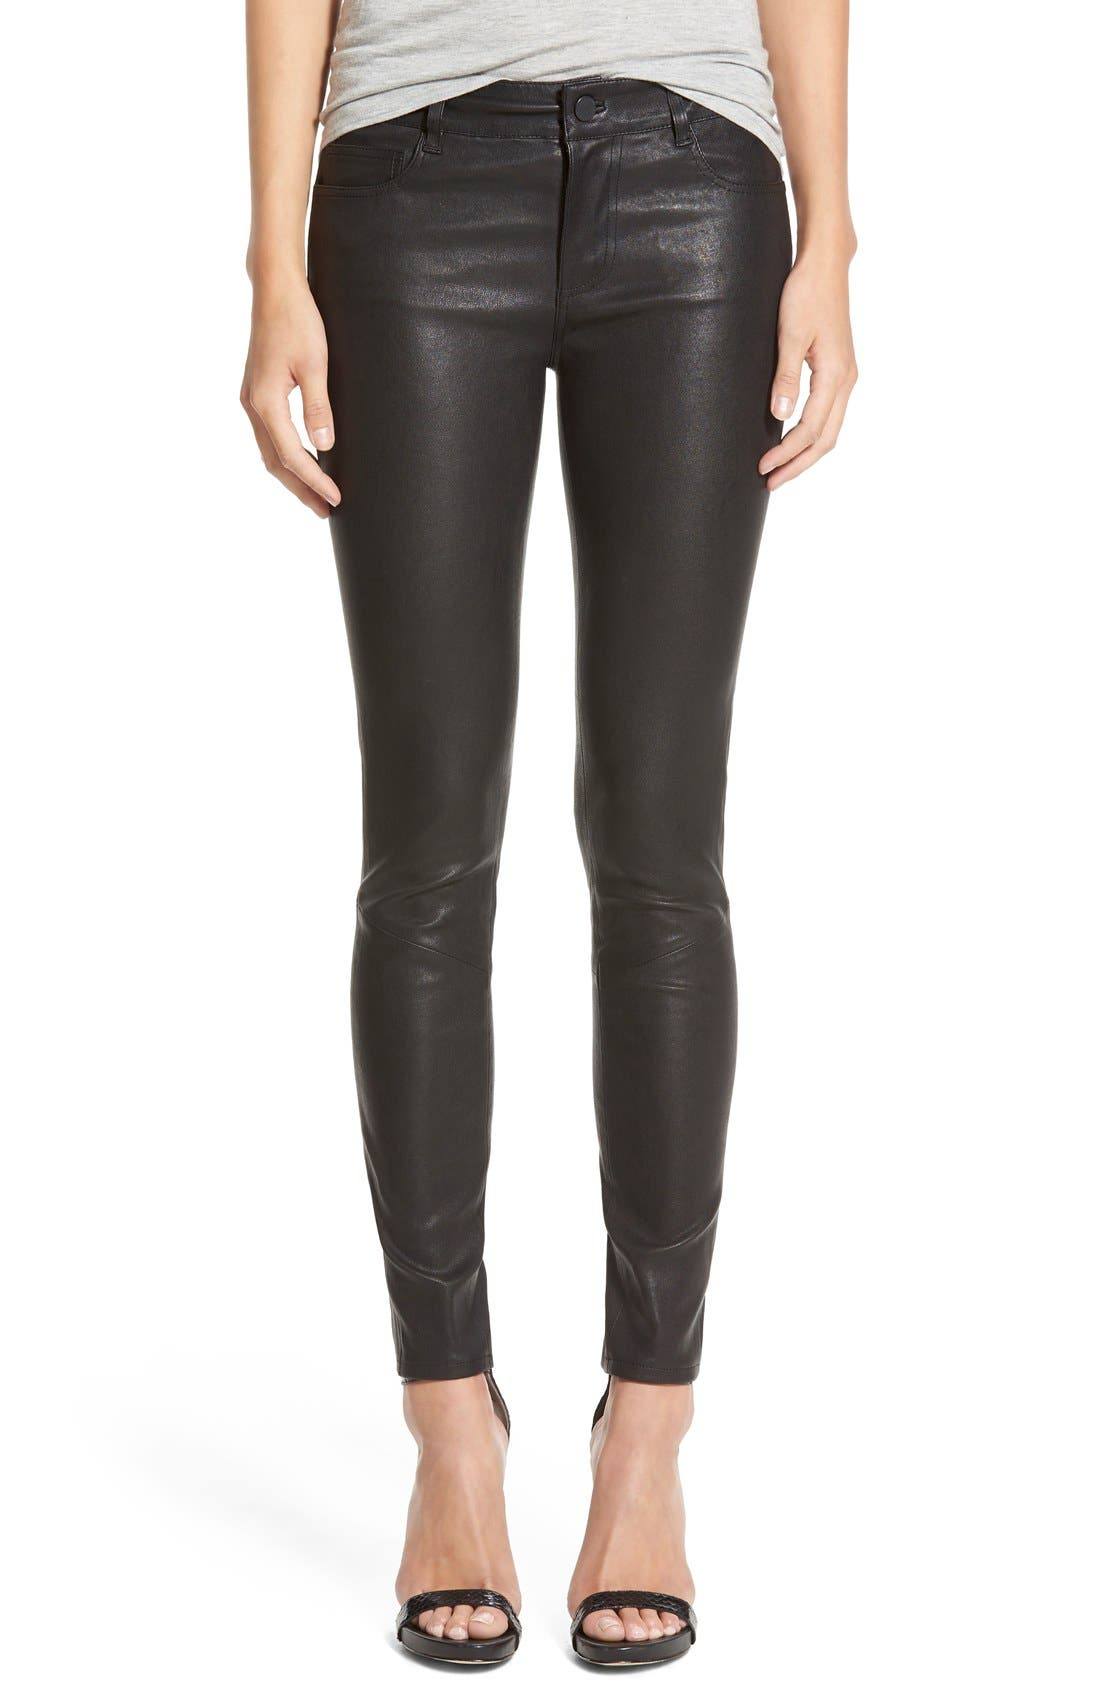 Alternate Image 1 Selected - Paige Denim 'Verdugo' Leather Pants